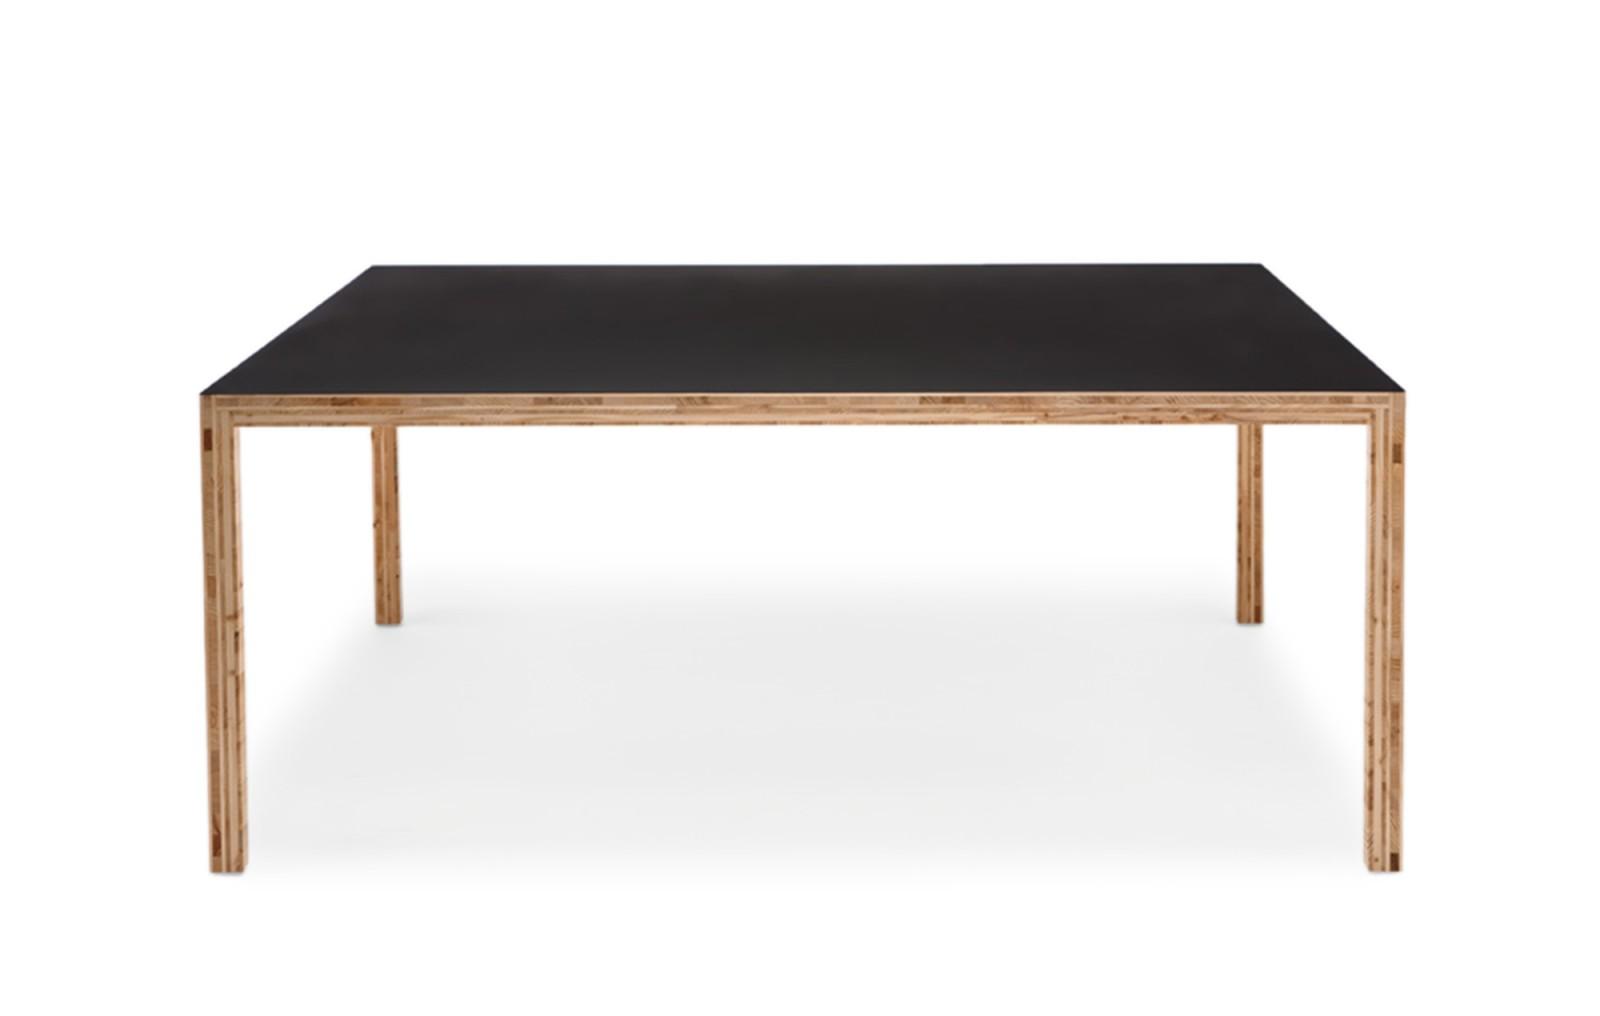 Caruso St John Table - Rectangular Black Linoleum